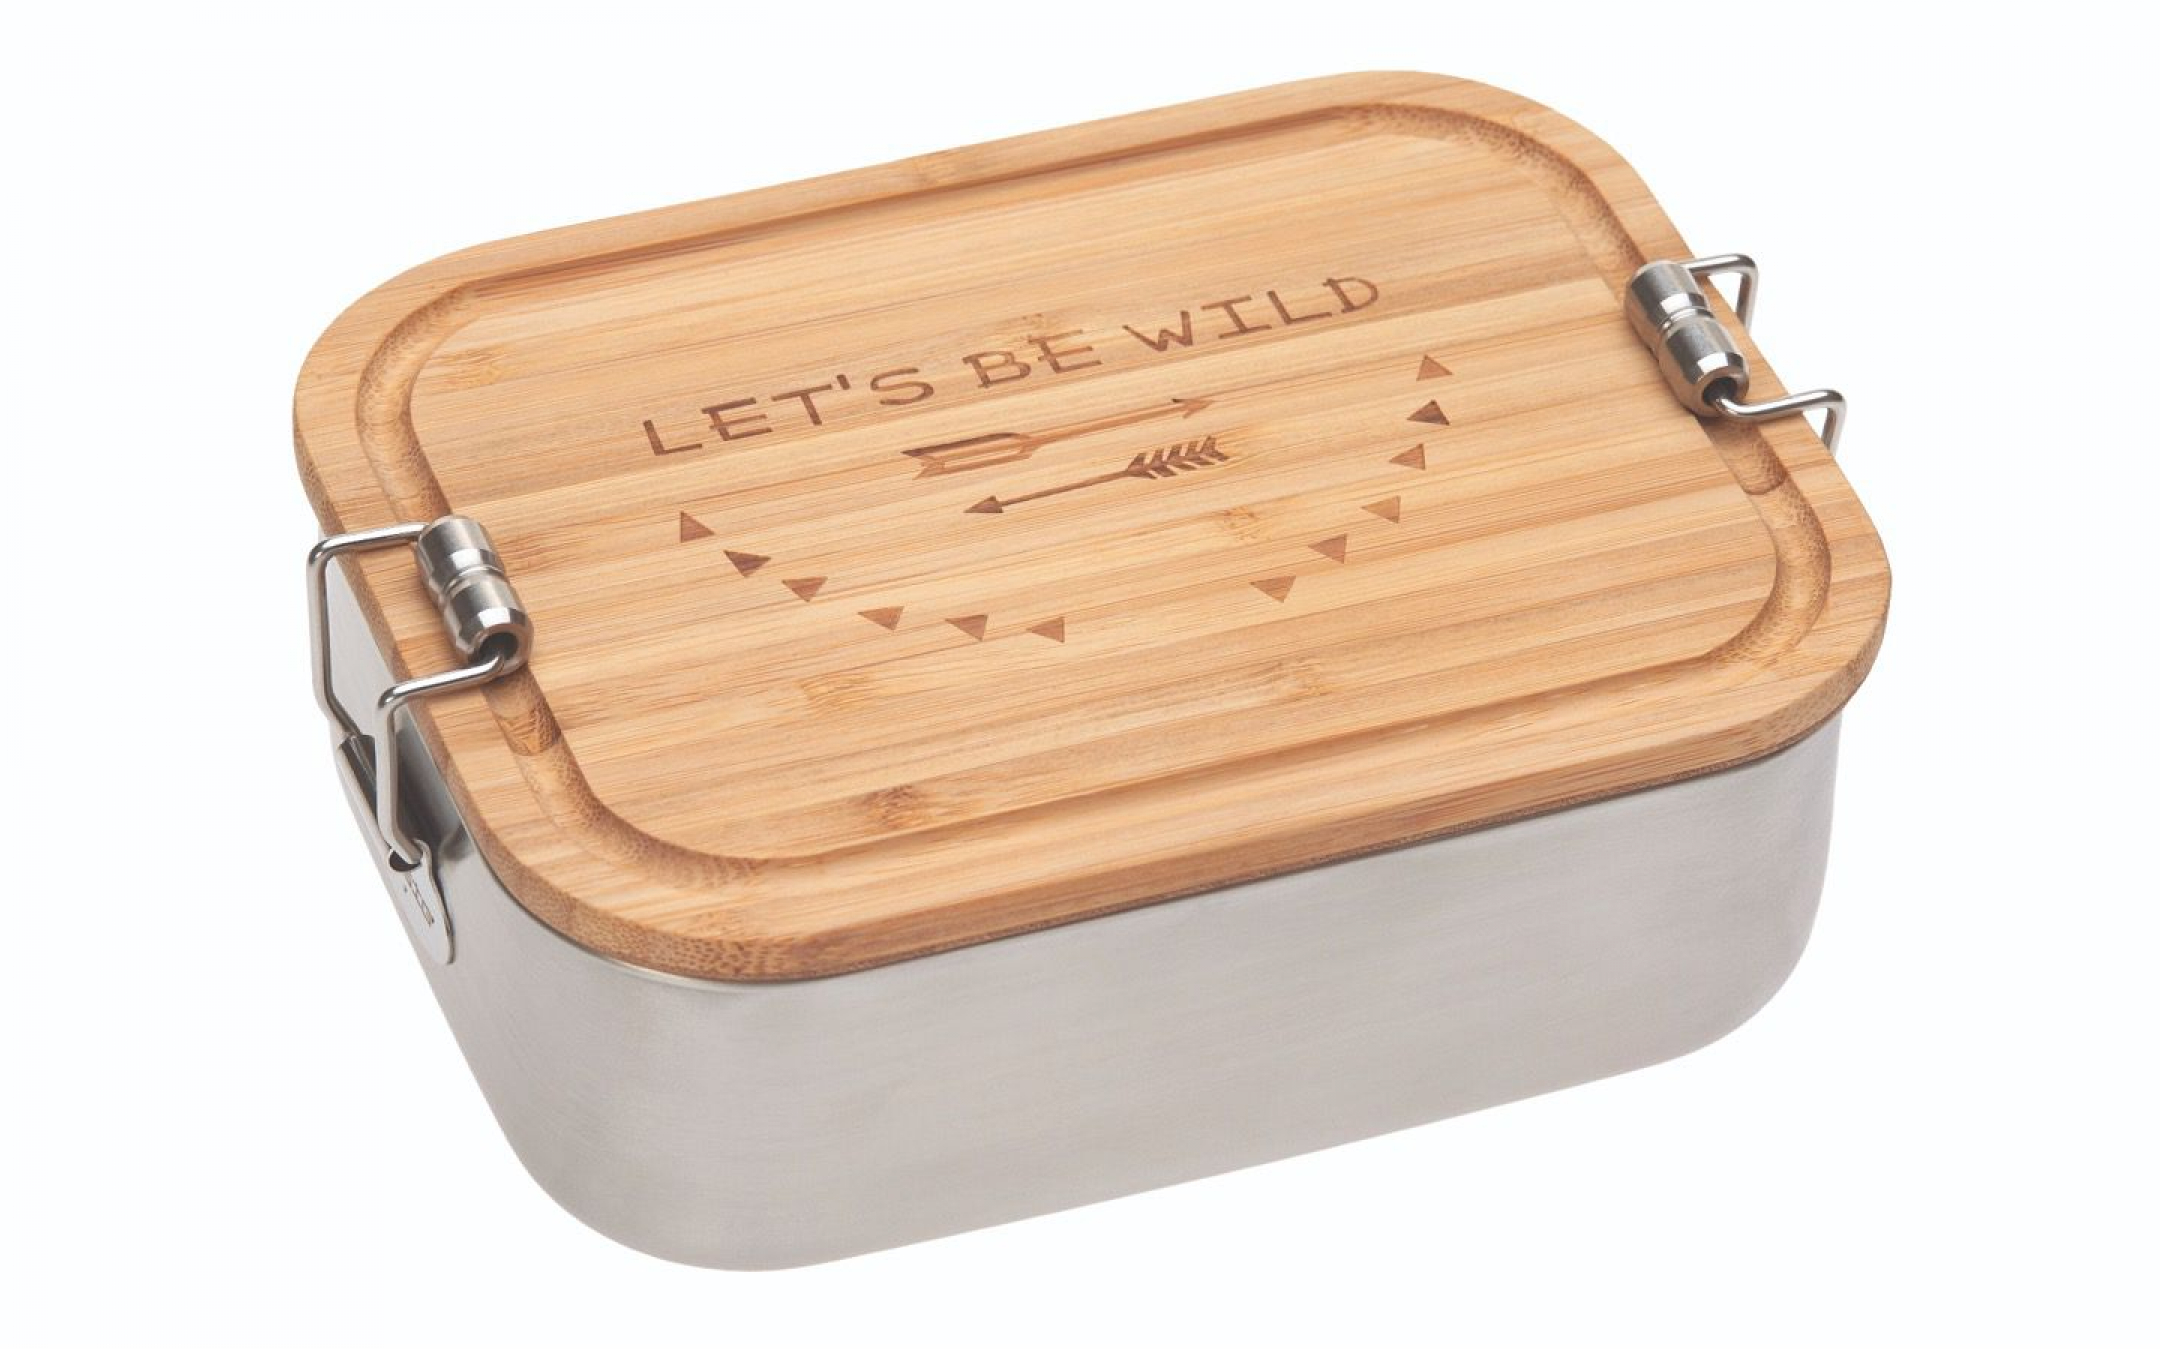 Lunch box for children